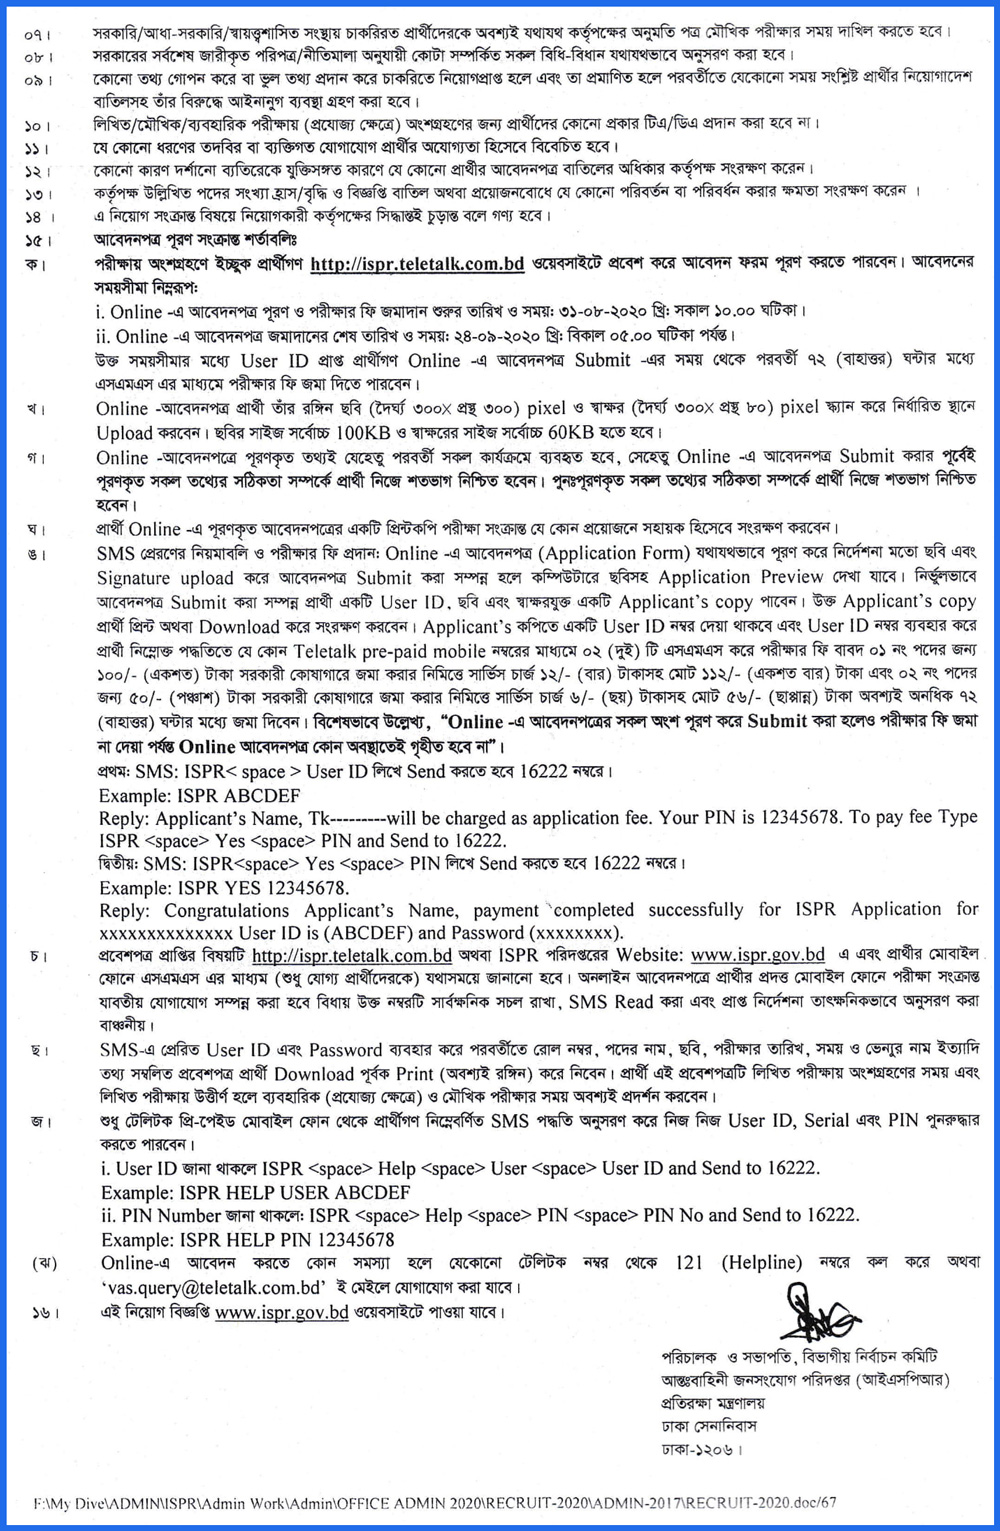 ISPR Teletalk BD 2020 - ispr.teletalk.com.bd